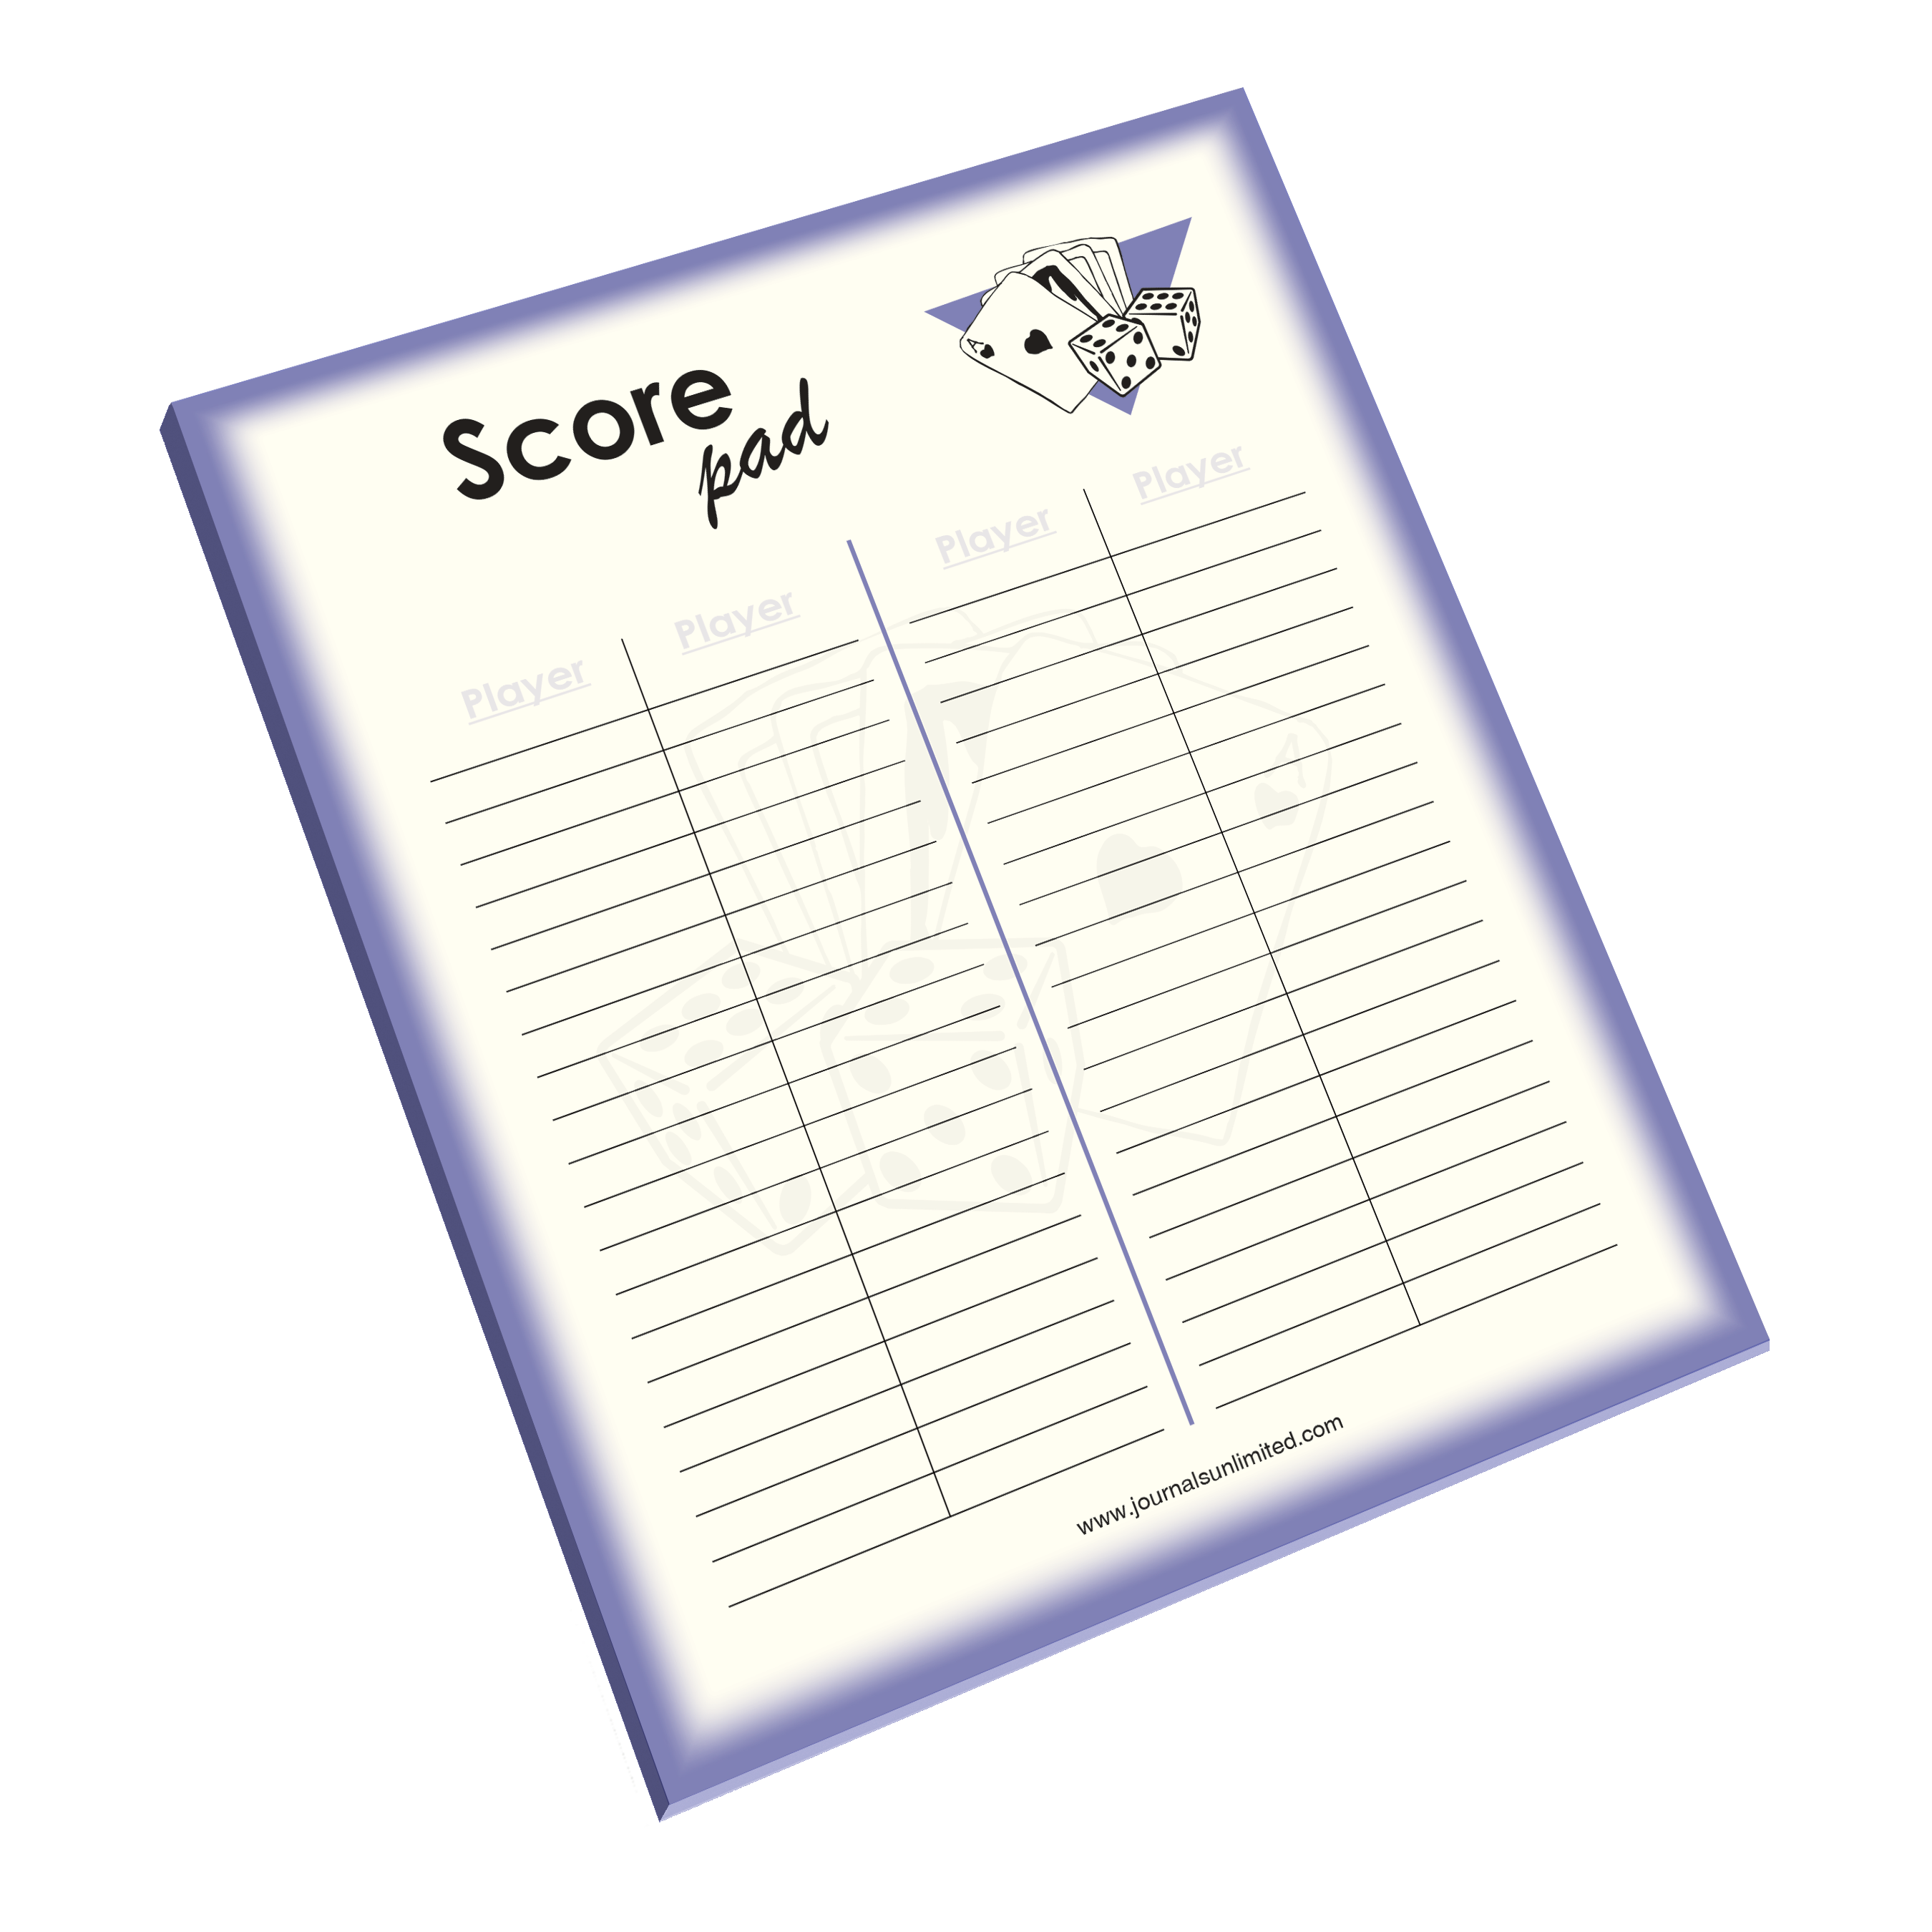 Jumbo Notepad, Score Keeper